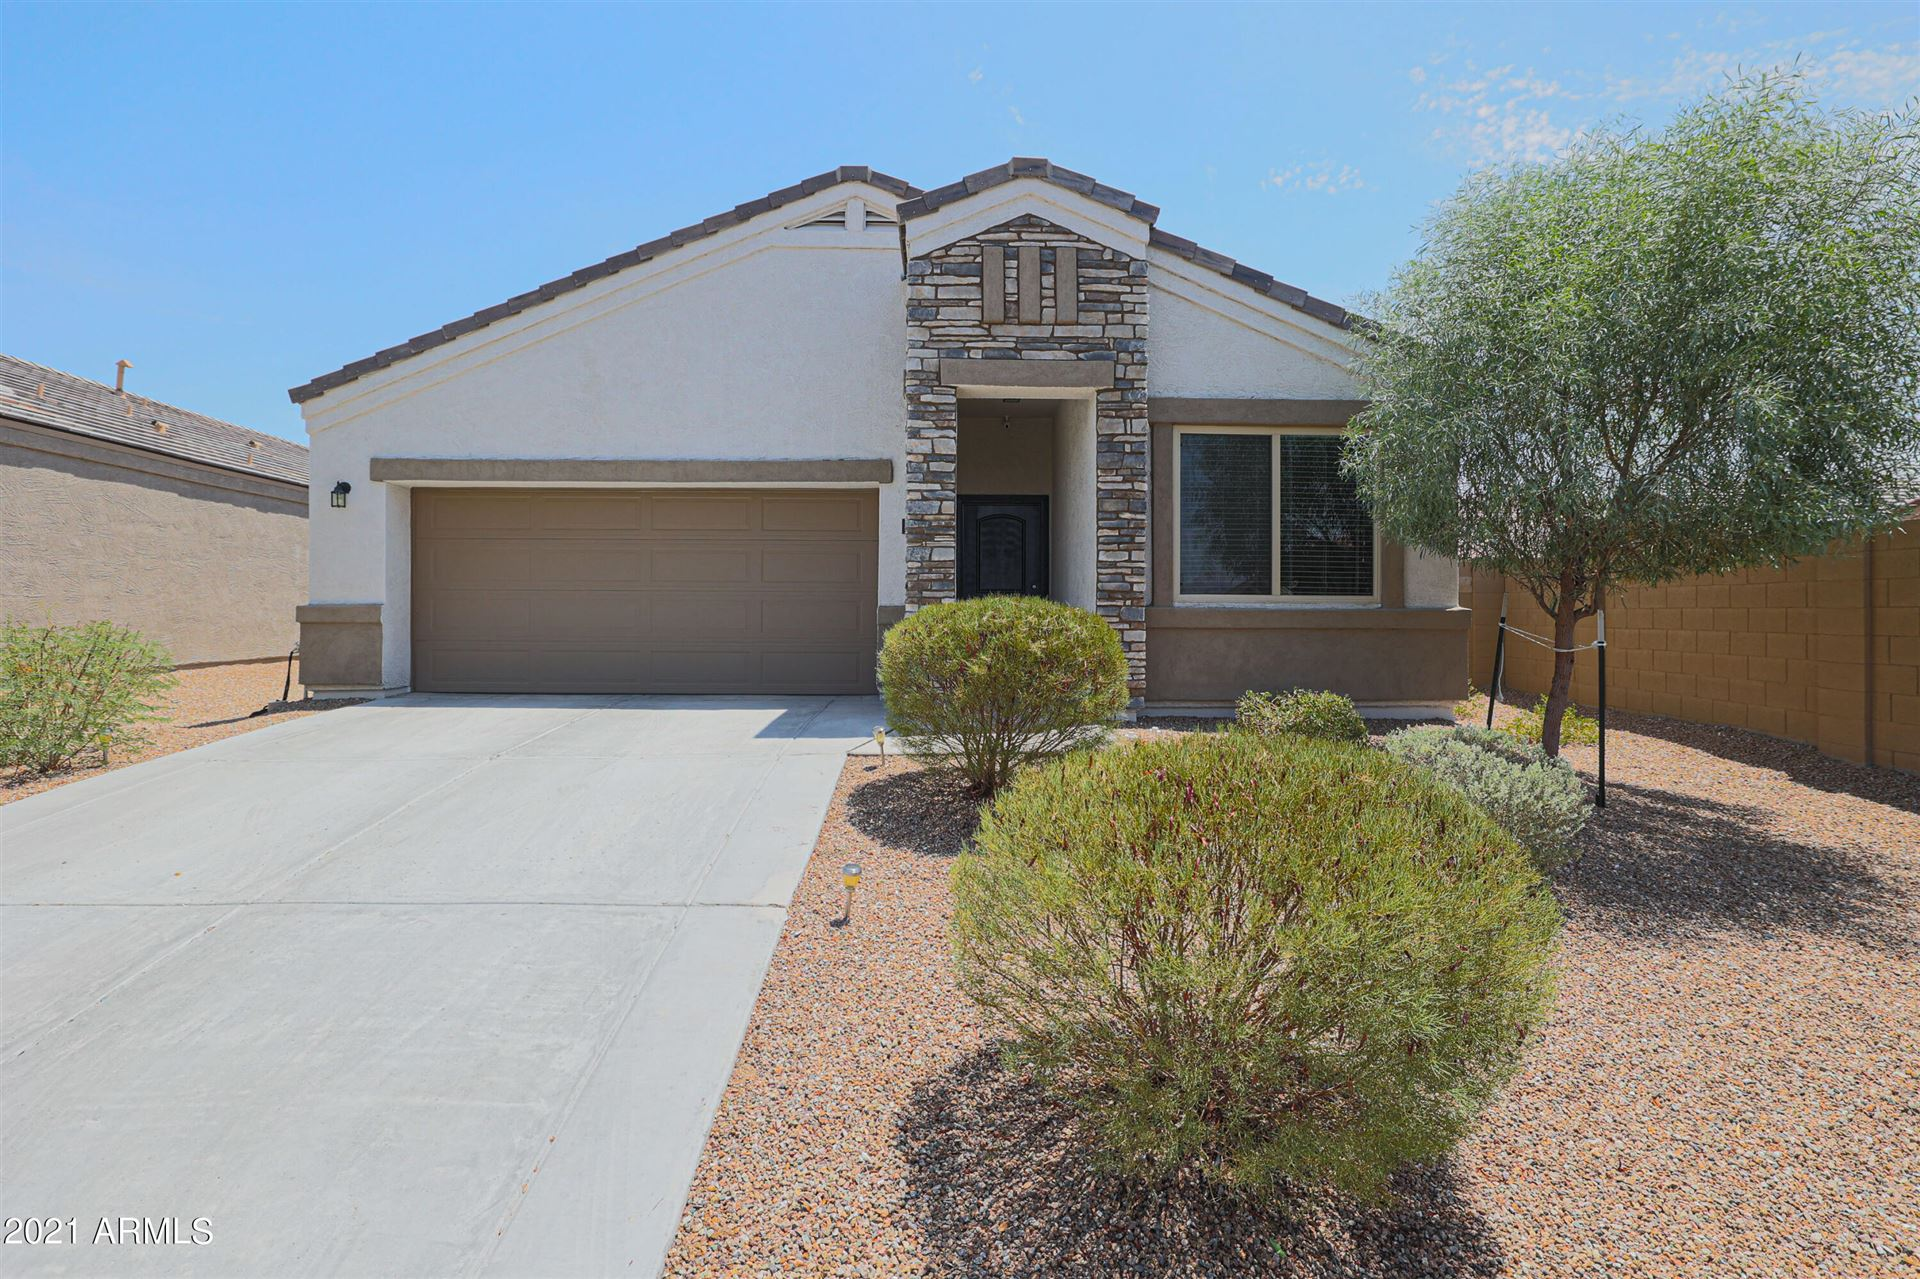 Photo of 3185 N 302ND Avenue, Buckeye, AZ 85396 (MLS # 6266165)